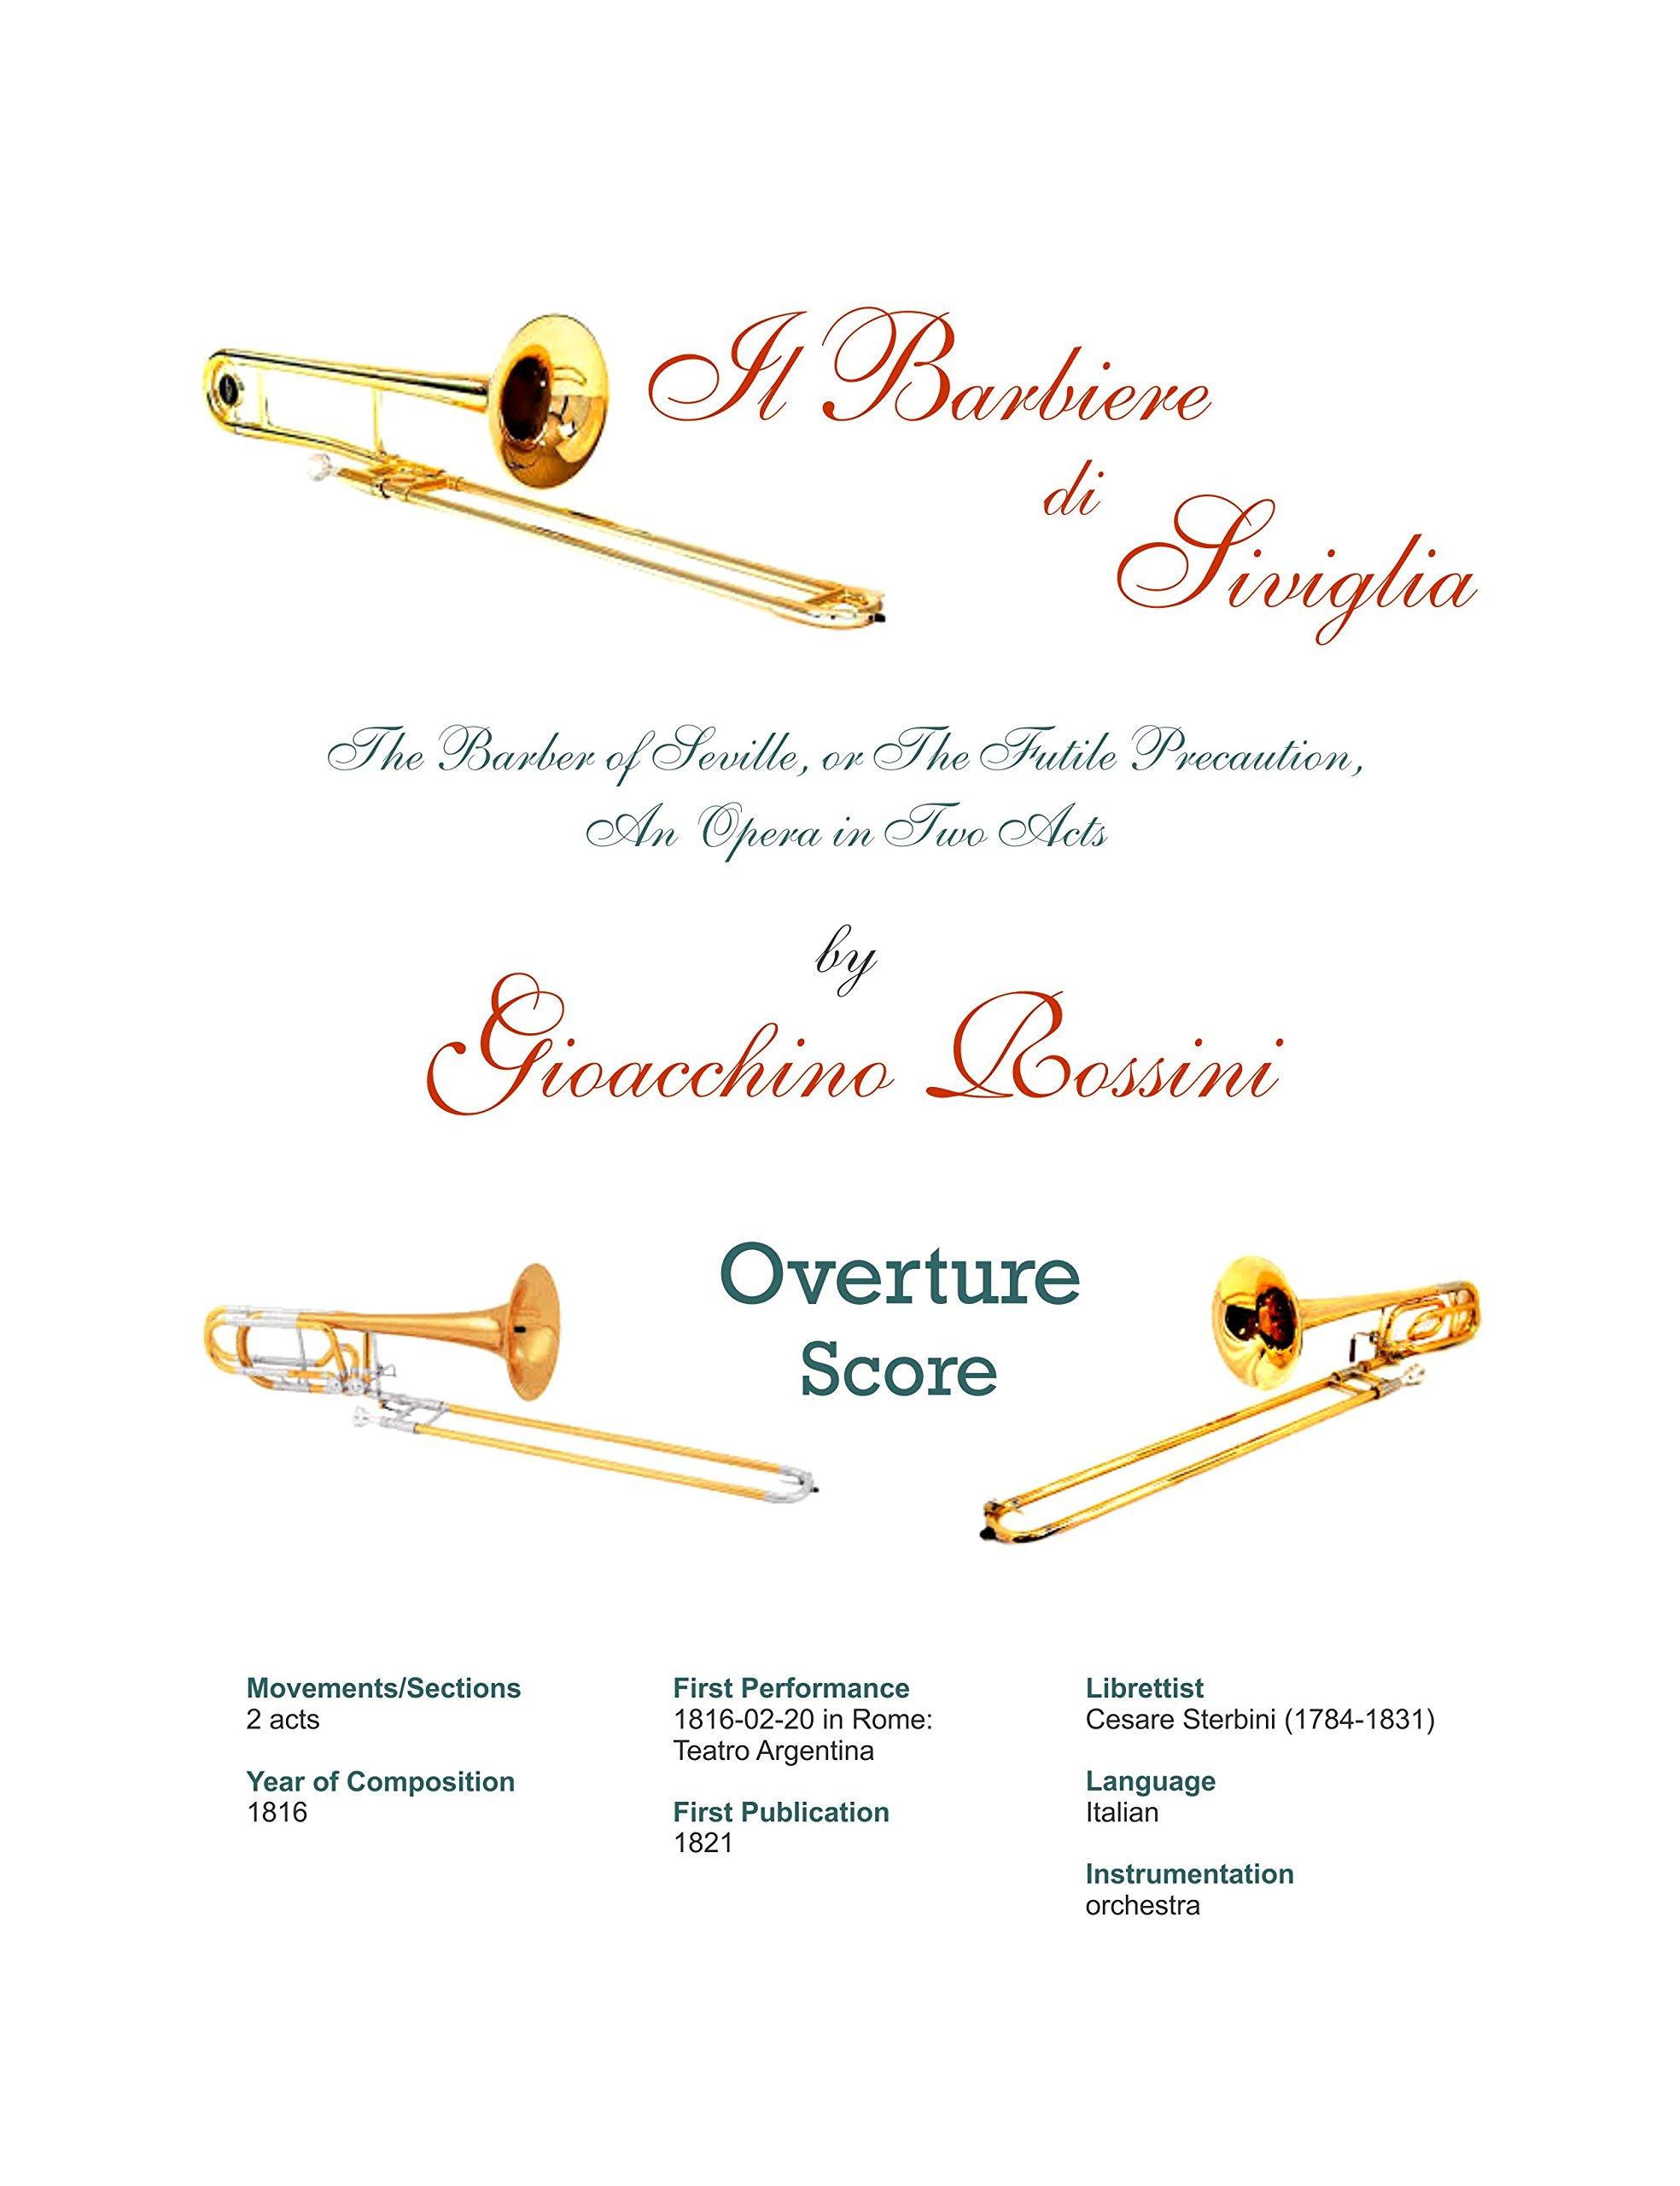 Download Il barbiere di Siviglia for 3 trombones (The Barber of Seville, or The Futile Precaution is an opera buffa in two acts) Score plus Trombone I, II, and III Psrts [4 Loose Leaf Books. 2017] ebook